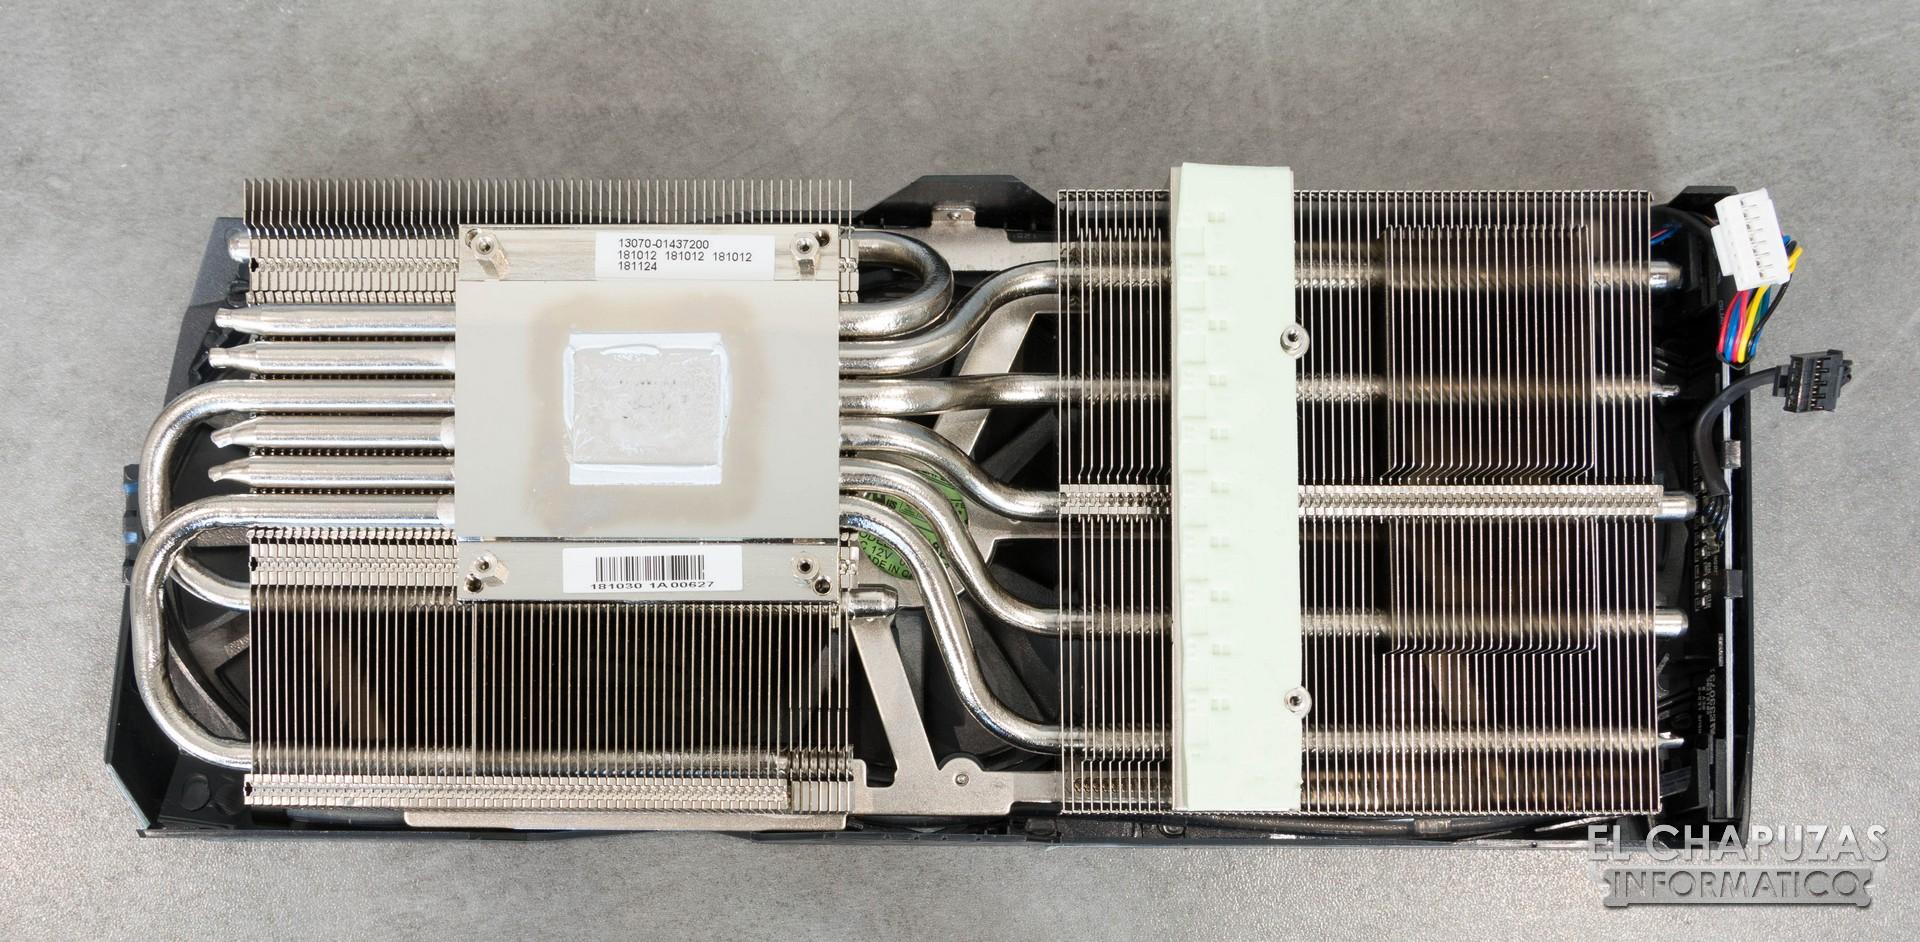 Review: Asus ROG Strix Gaming GeForce RTX 2060 OC 6GB